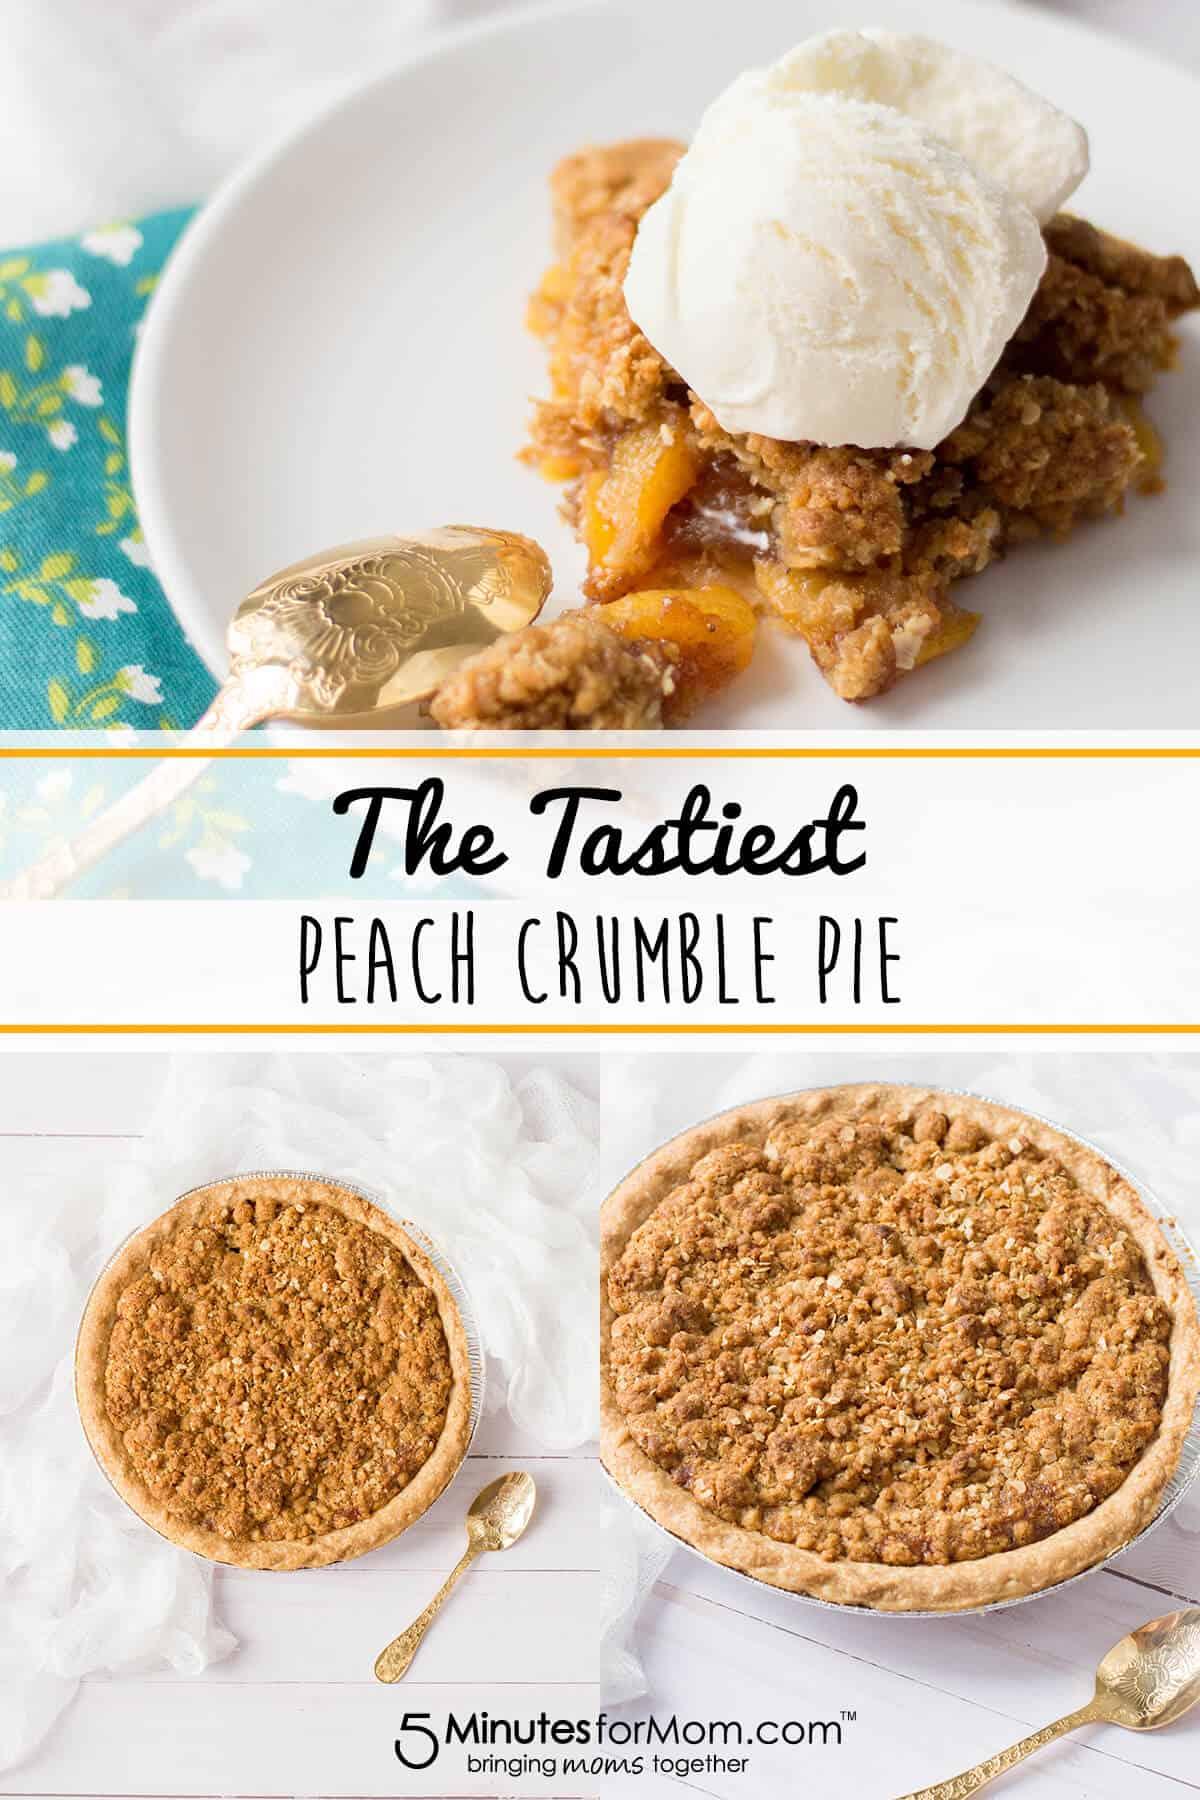 Peach Crumble Pie Recipe - This easy dessert recipe is packed full of flavor! #peach #pie